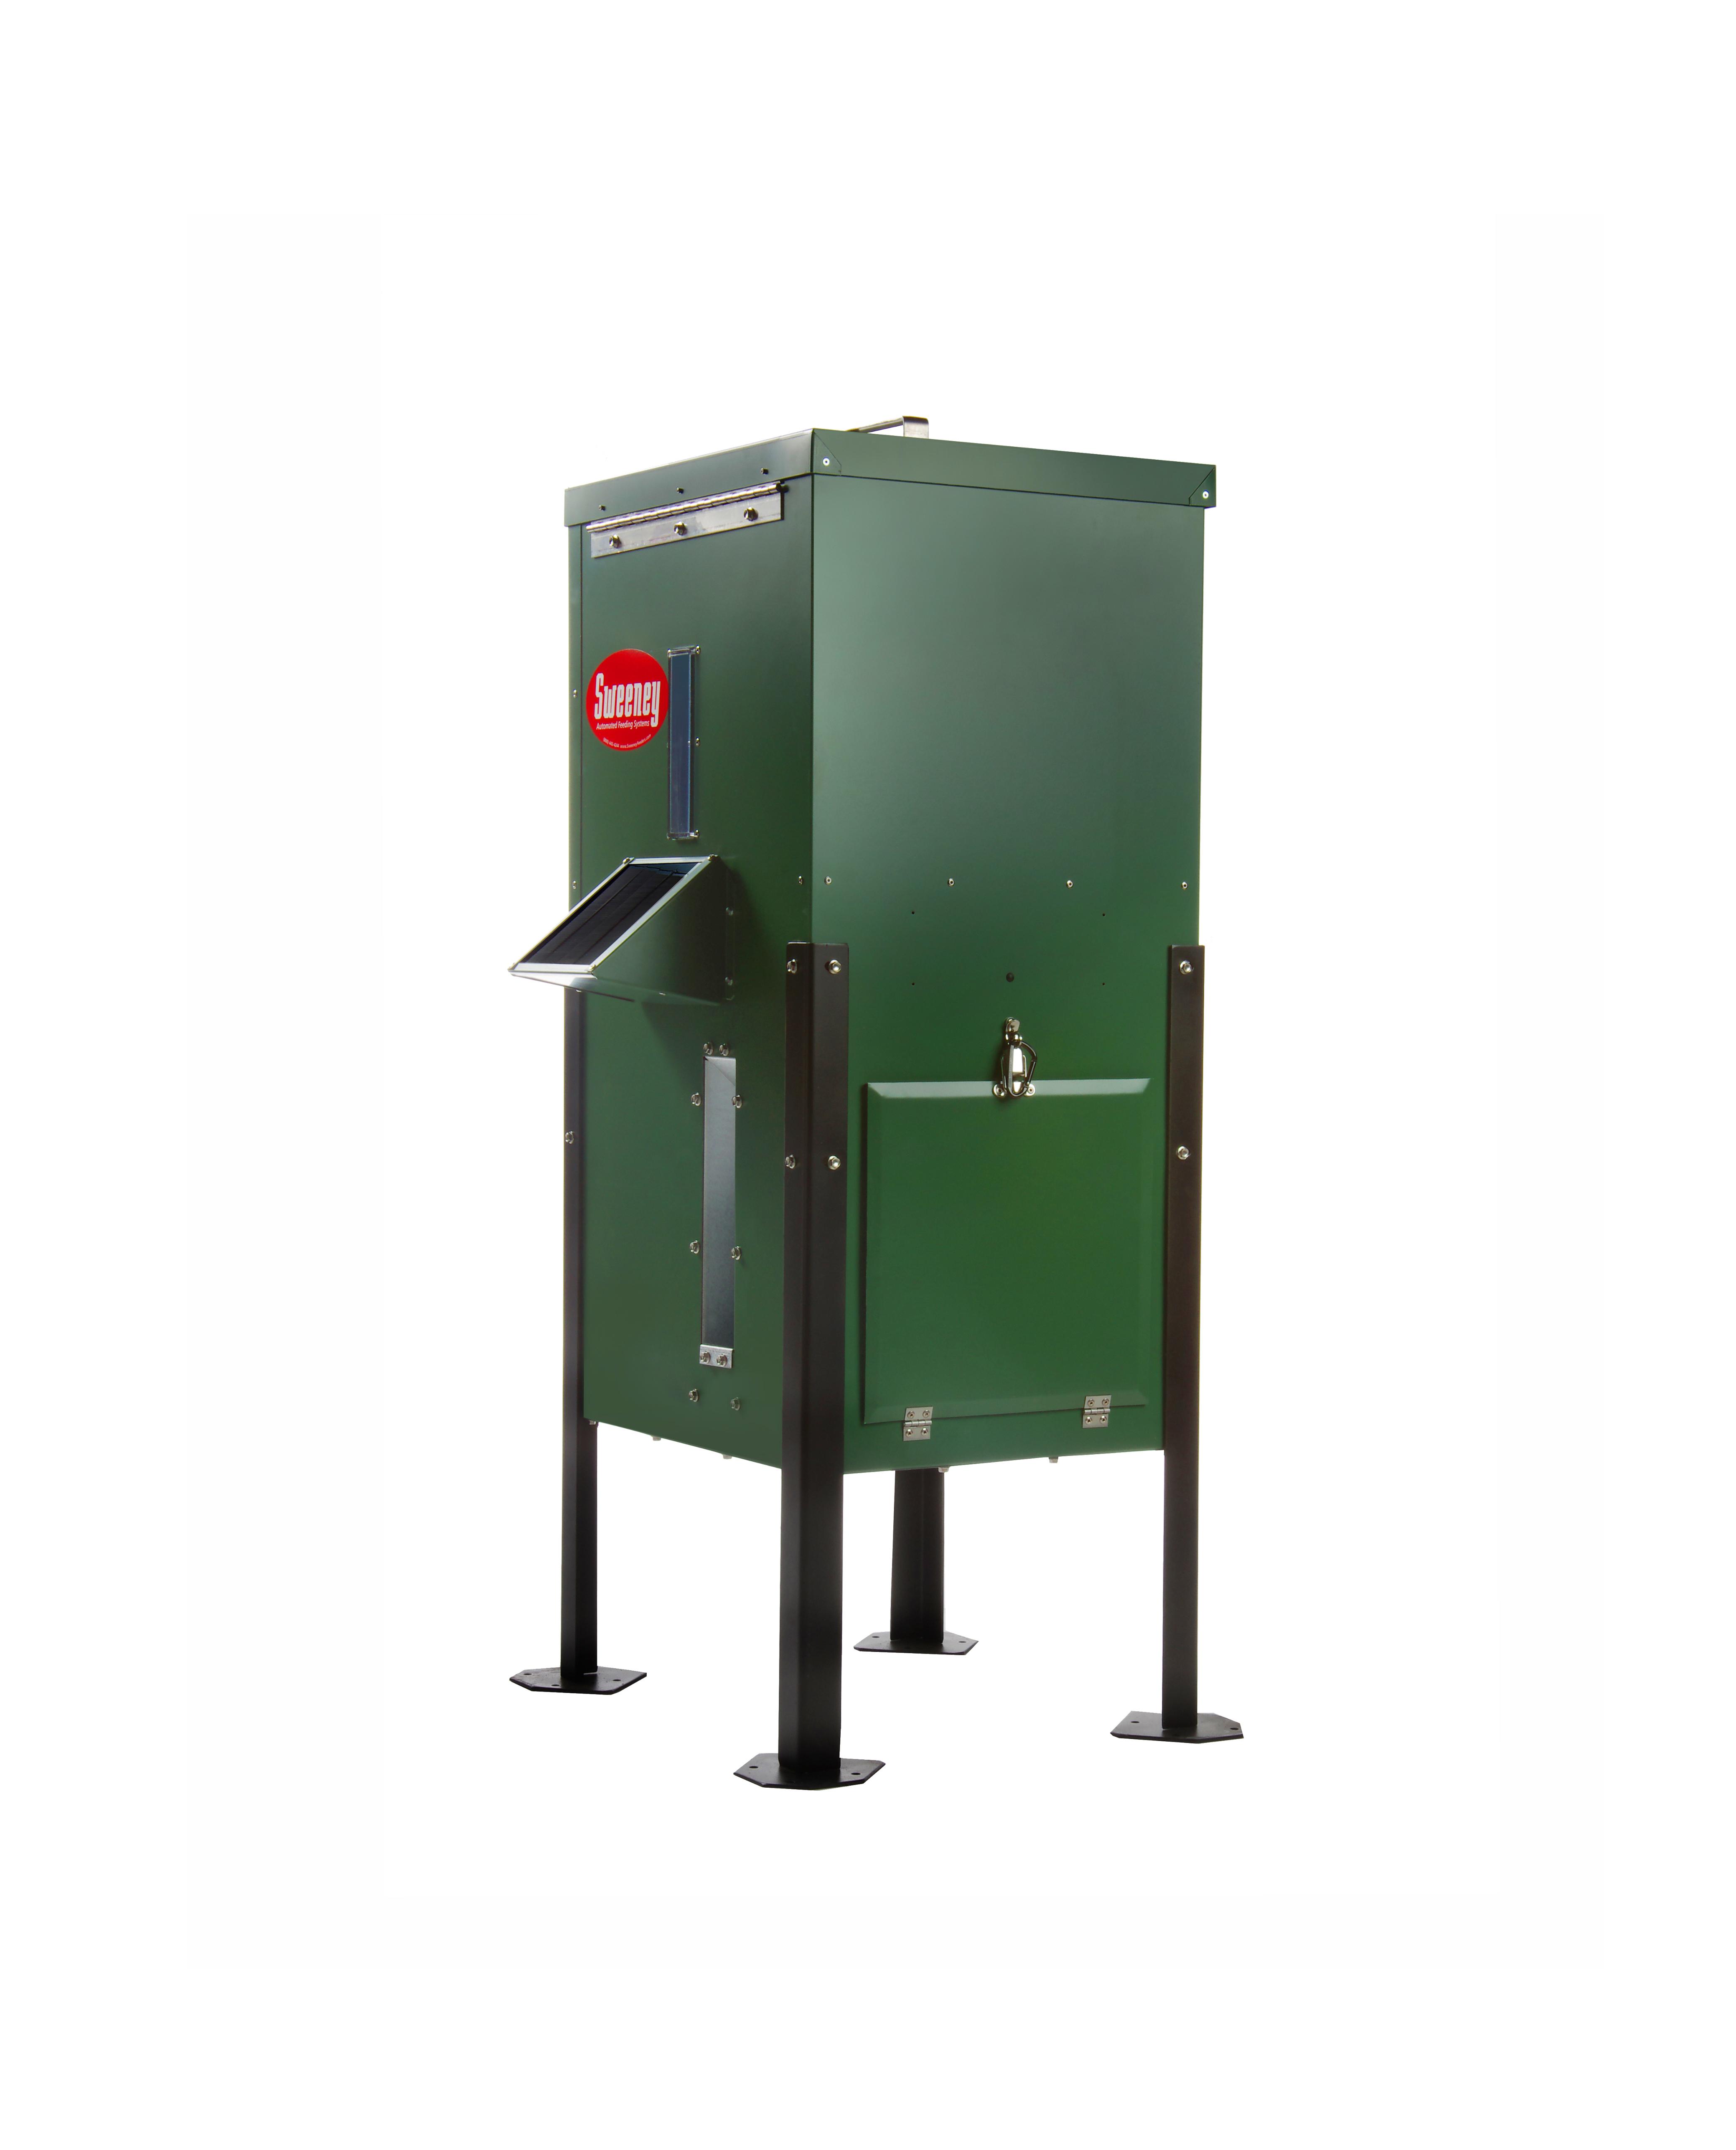 directional feeder 125 lb capacity sweeney feeders